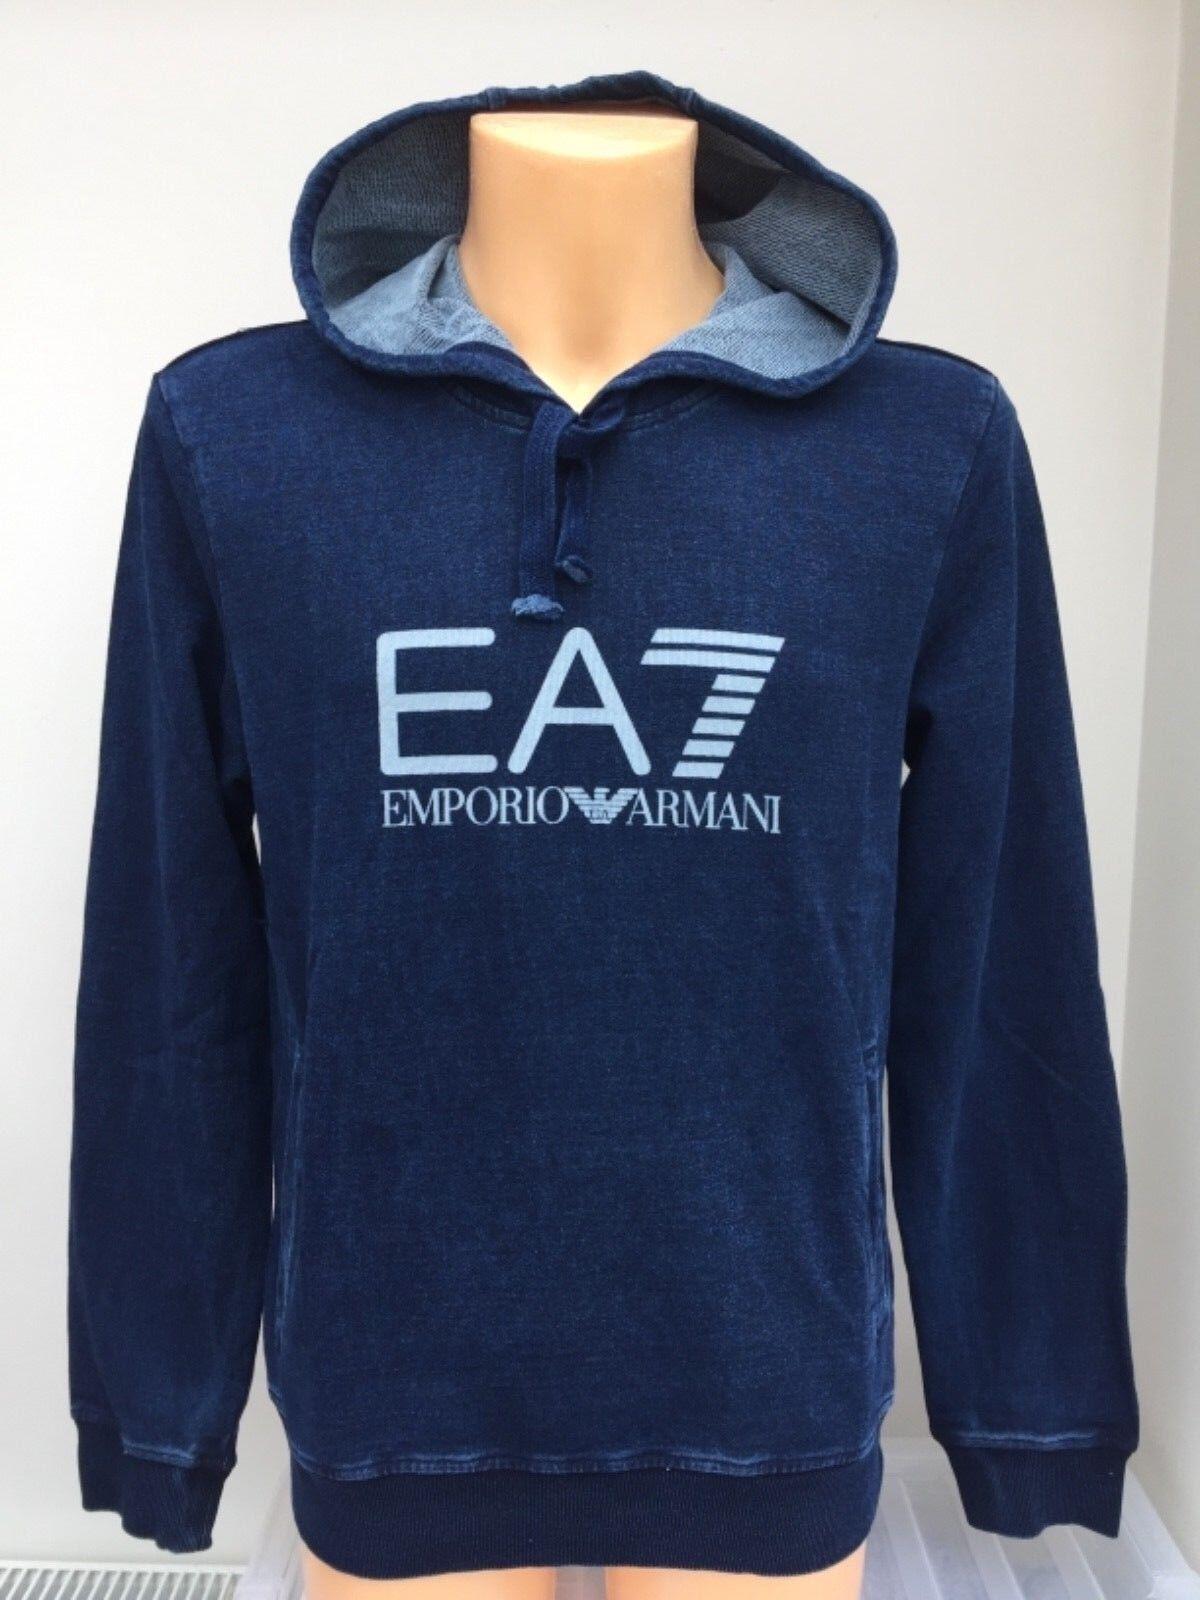 EMPORIO ARMANI EA7 Indigo OTH Hoodie Large EA7 Chest Logo Größes S M L XL BNWT  | Zu verkaufen